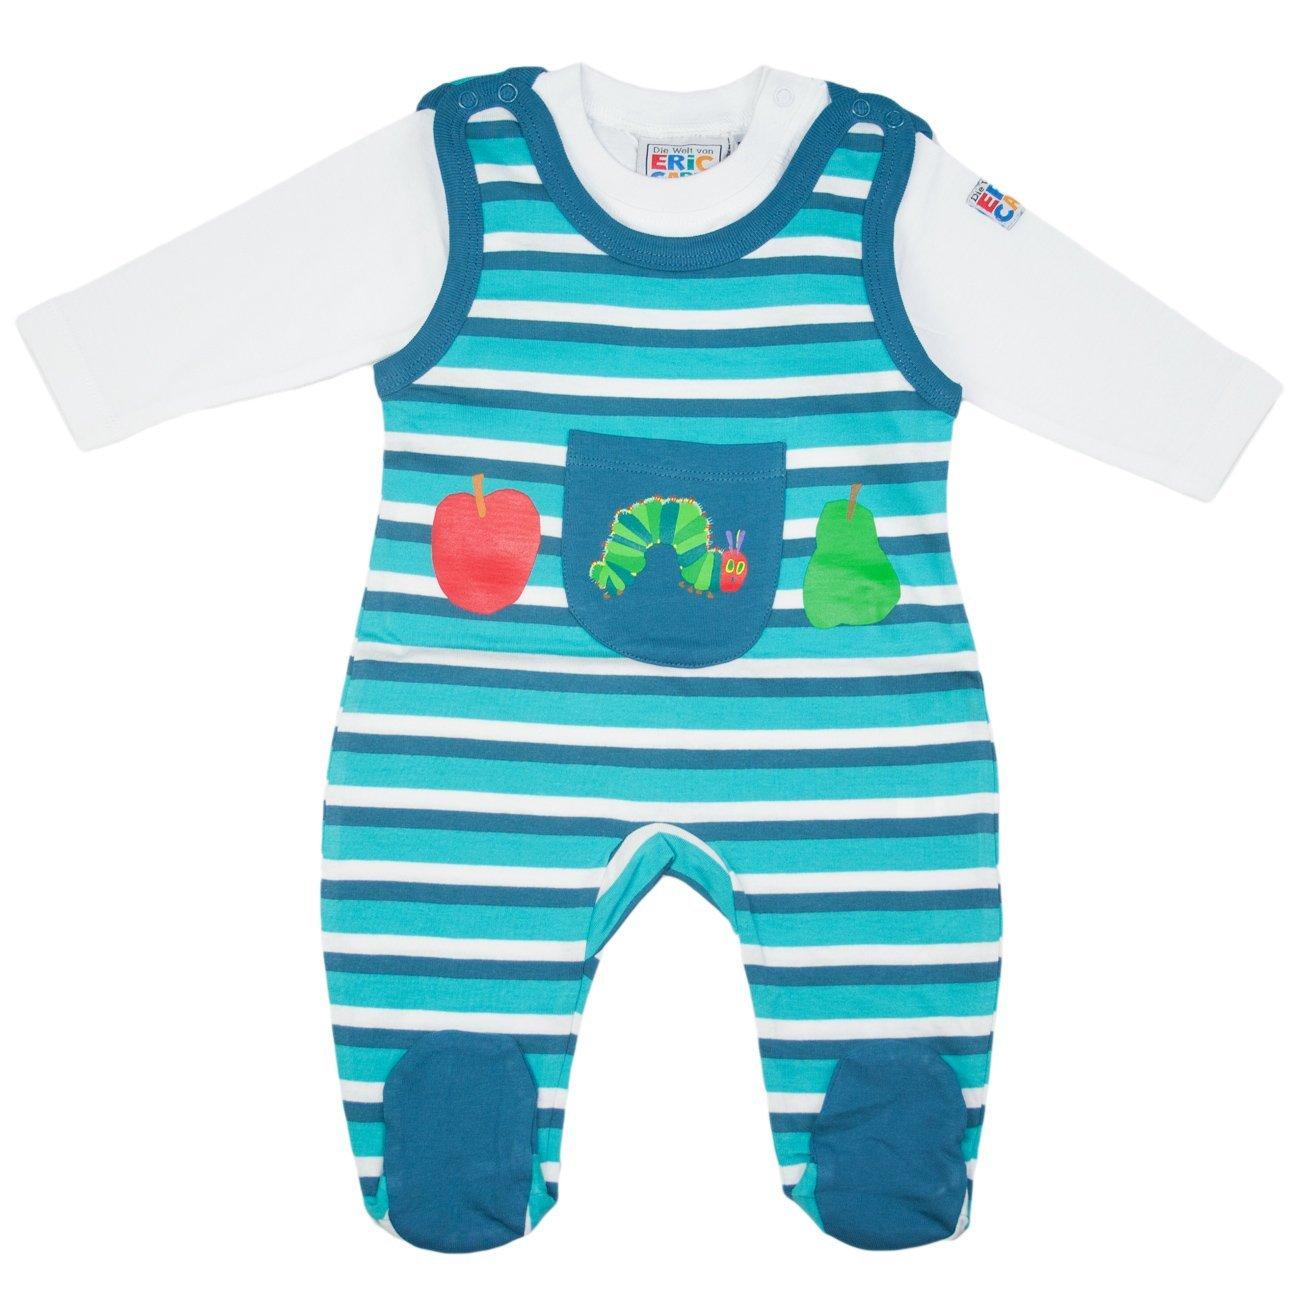 baby strampler set die kleine raupe nimmersatt gr e 50 56 blau pink gr n ebay. Black Bedroom Furniture Sets. Home Design Ideas